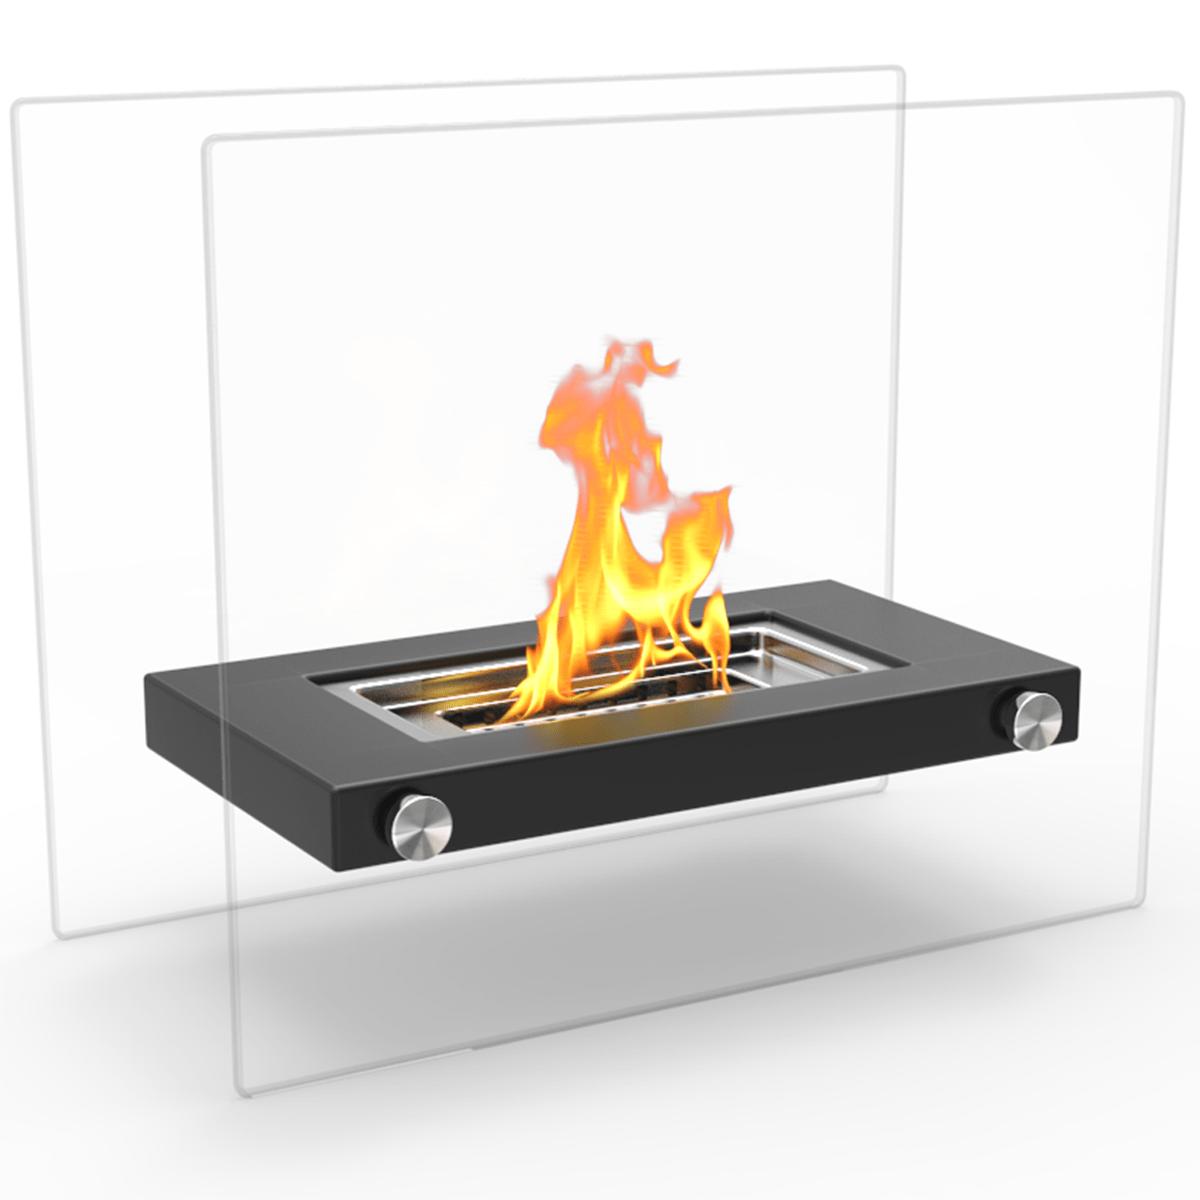 Monrow Ventless Tabletop Portable Bio Ethanol Fireplace In